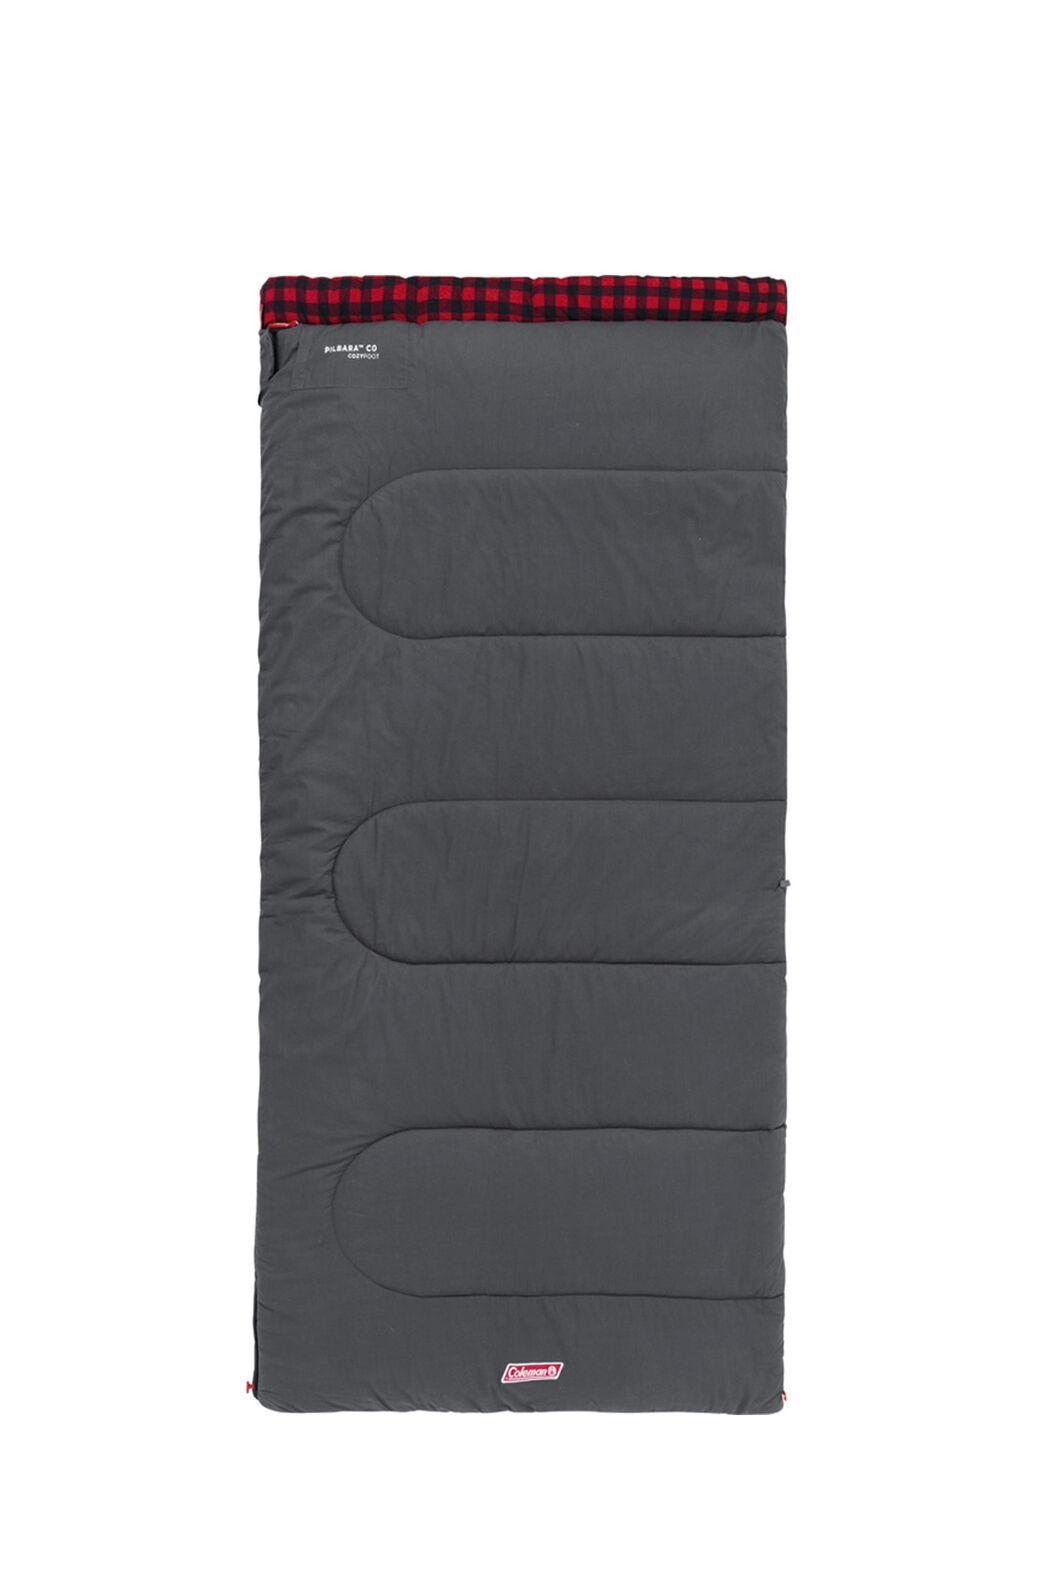 Coleman Pilbara Tall Camper Sleeping Bag, None, hi-res